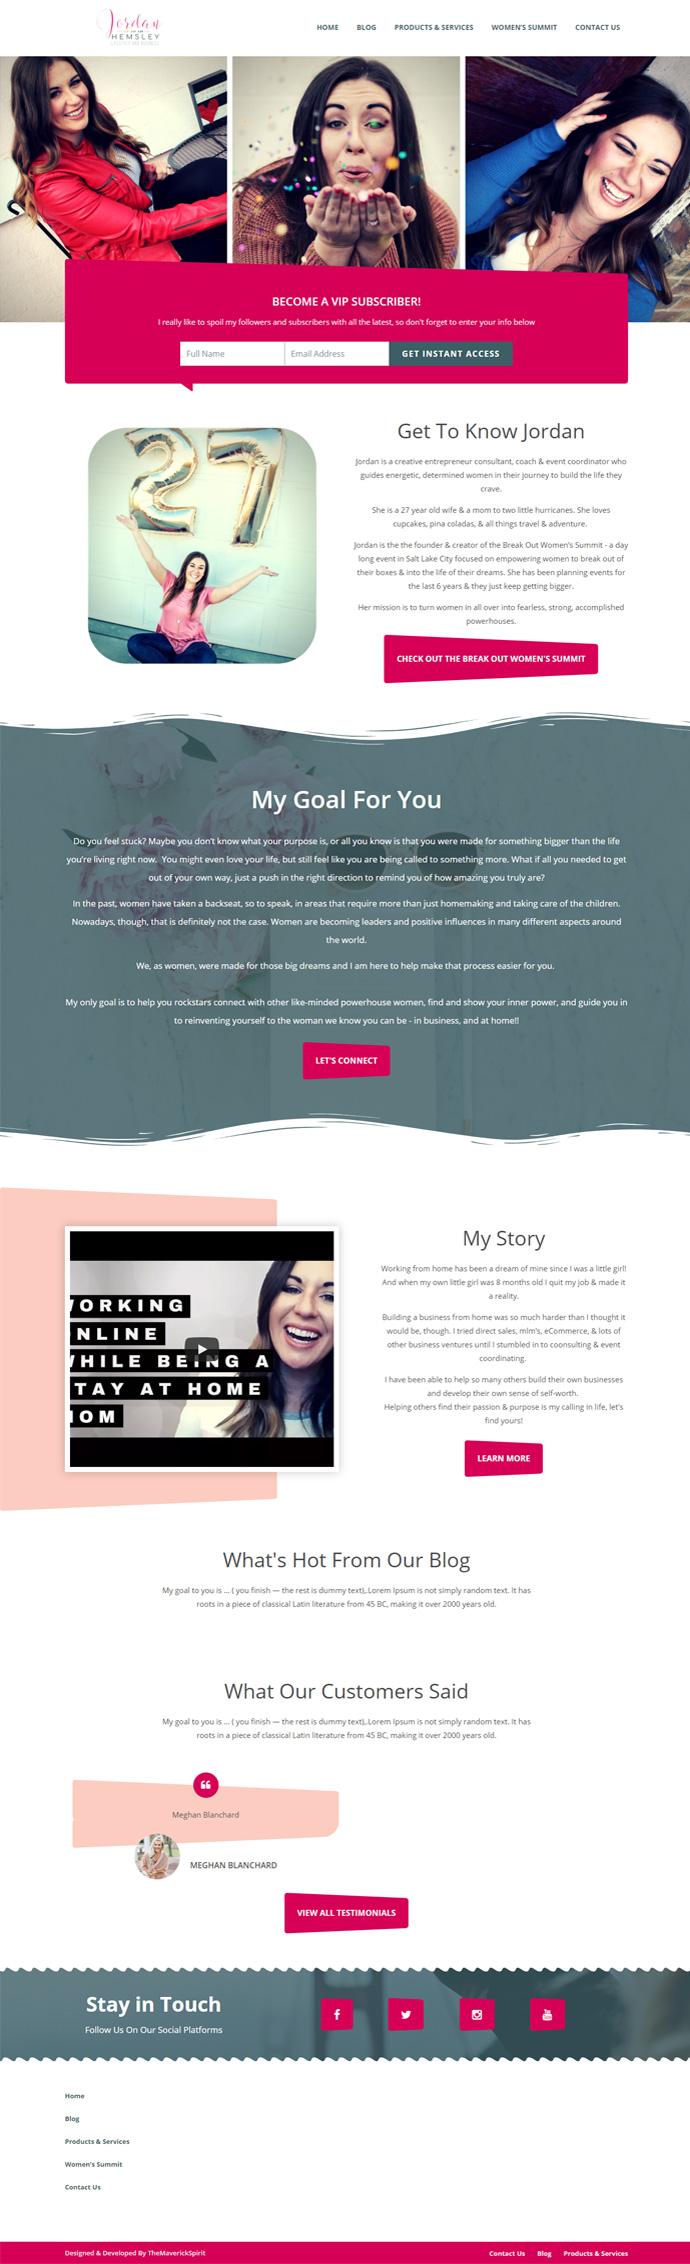 jordanhemsley-personal-portfolio-thememantis